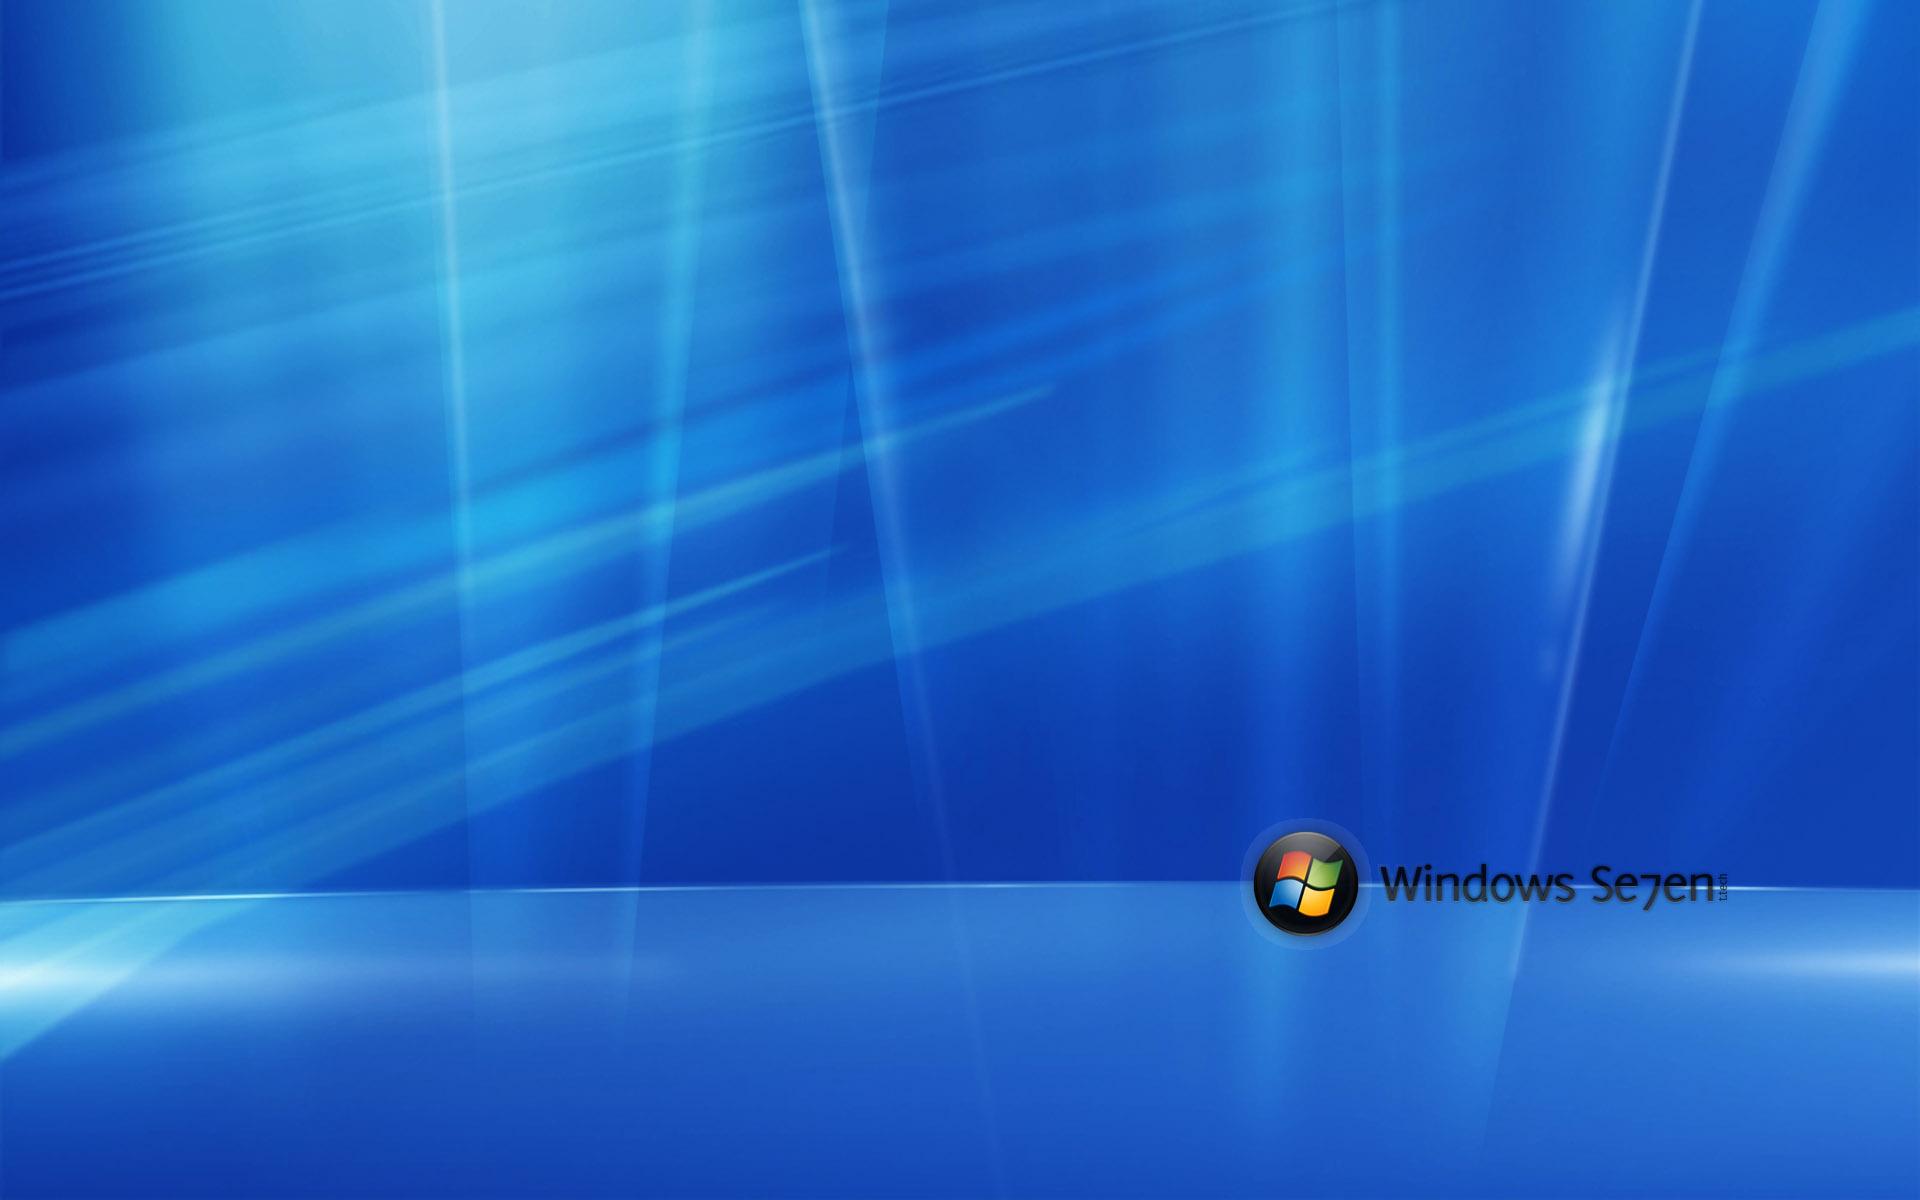 1280x800 Windows Se7en Desktop Pc And Mac Wallpaper 1920x1200